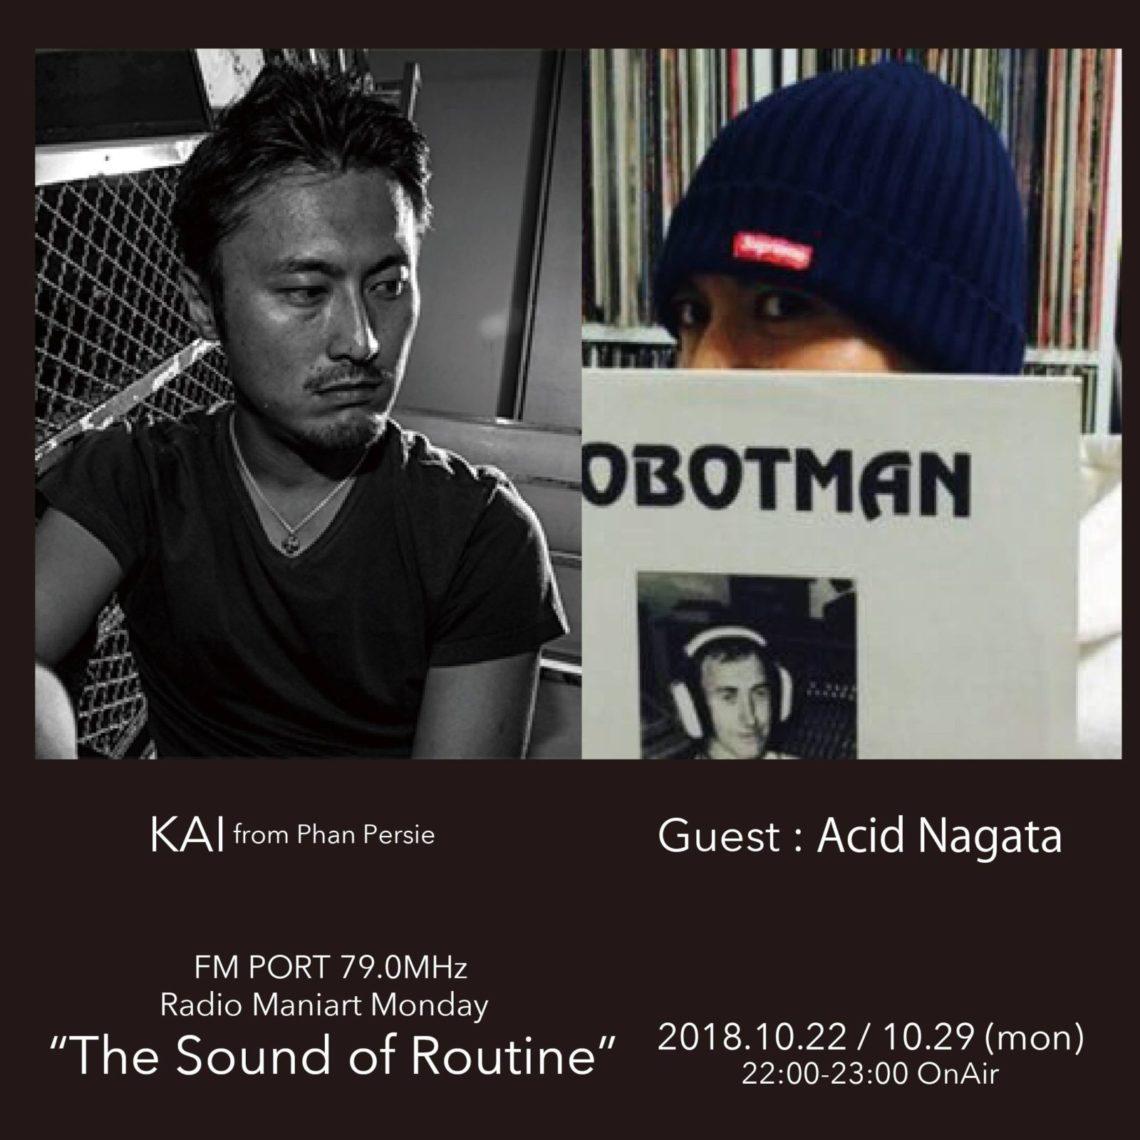 2018.10.22 MON, 10.29 MON – KAI : Navigator on FM PORT / the Sound of Routine – Guest: Acid Nagata